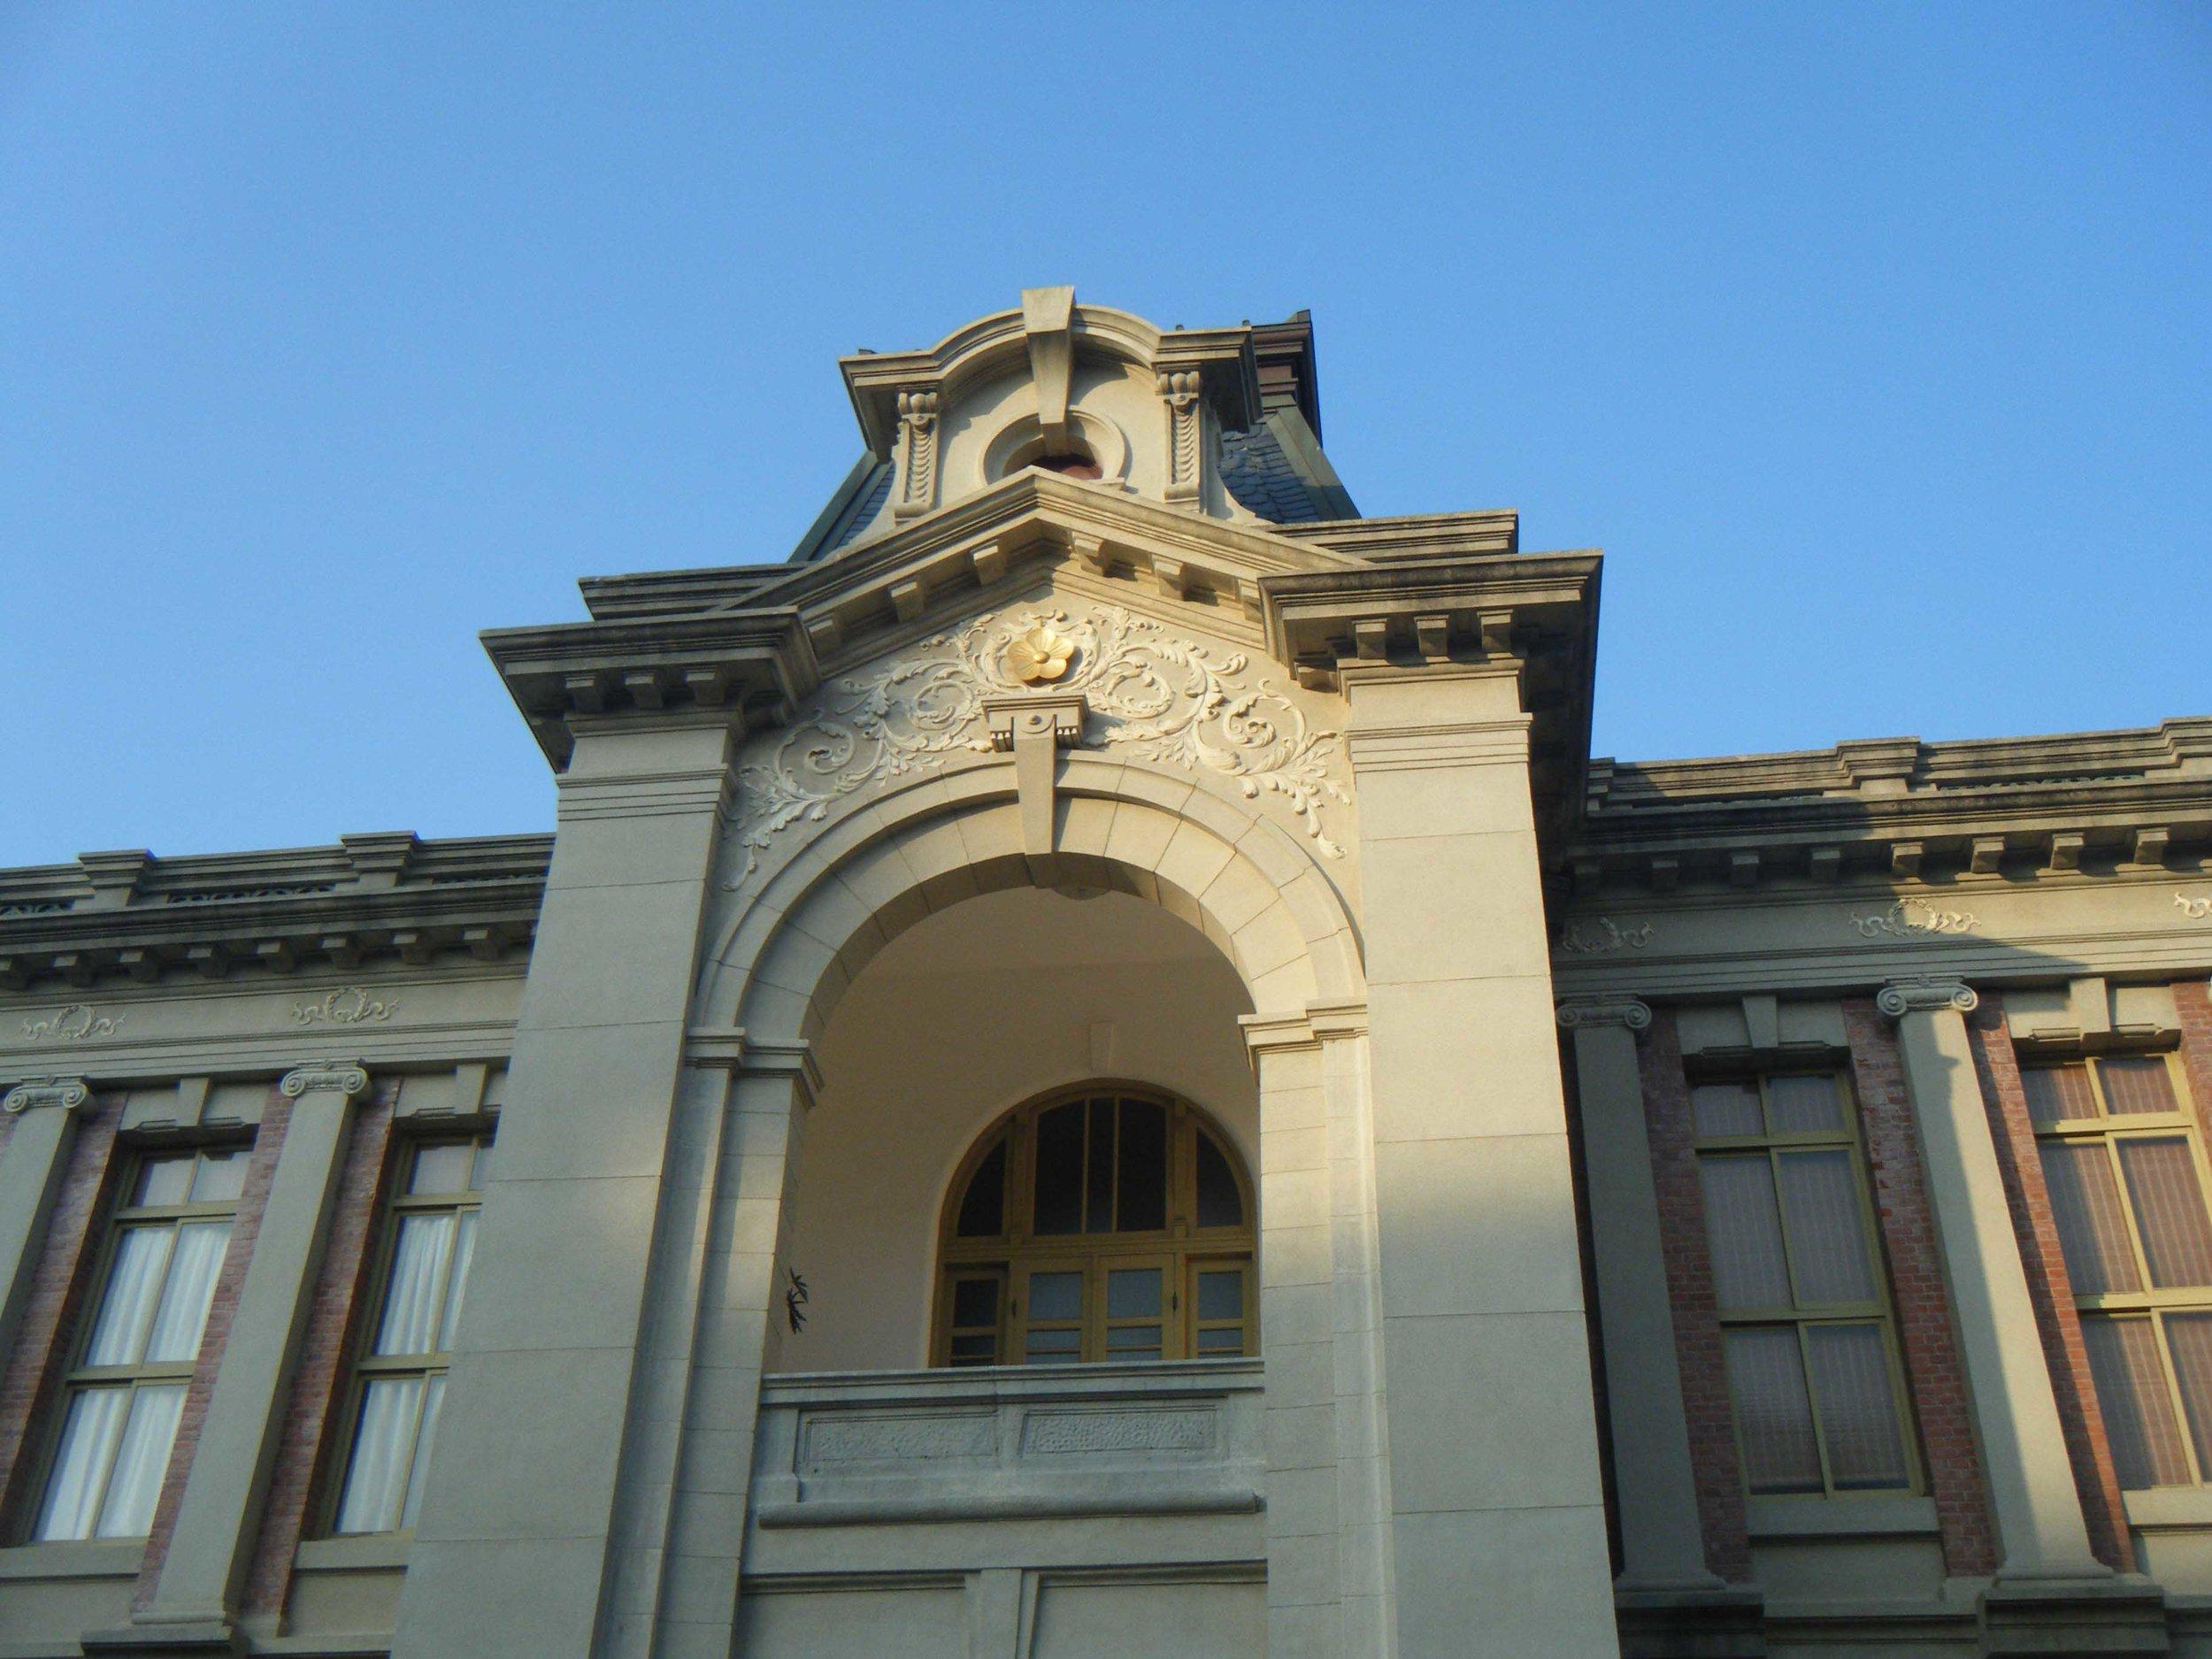 Tainan historical tour 10-28-10.jpg